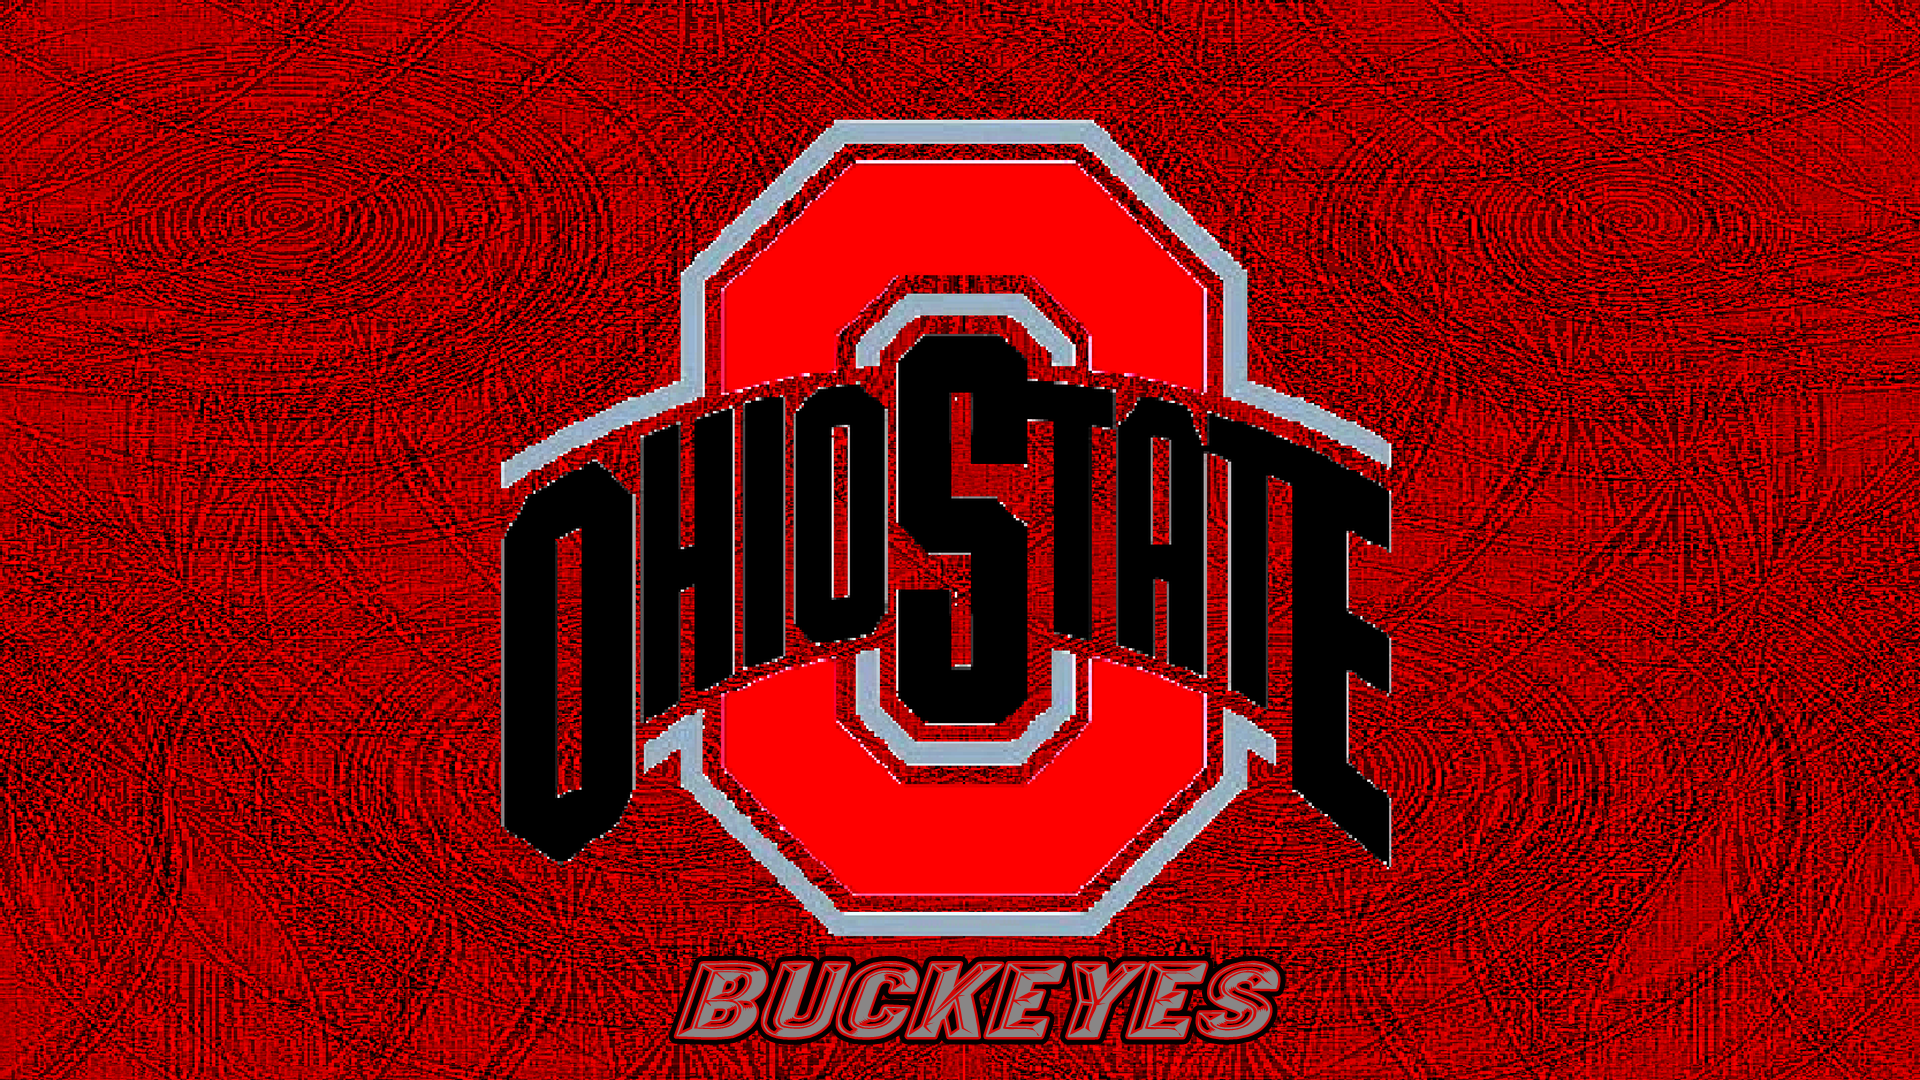 Ohio Wallpaper 31 Images Ohio State Buckeyes Ohio State Ohio State Wallpaper